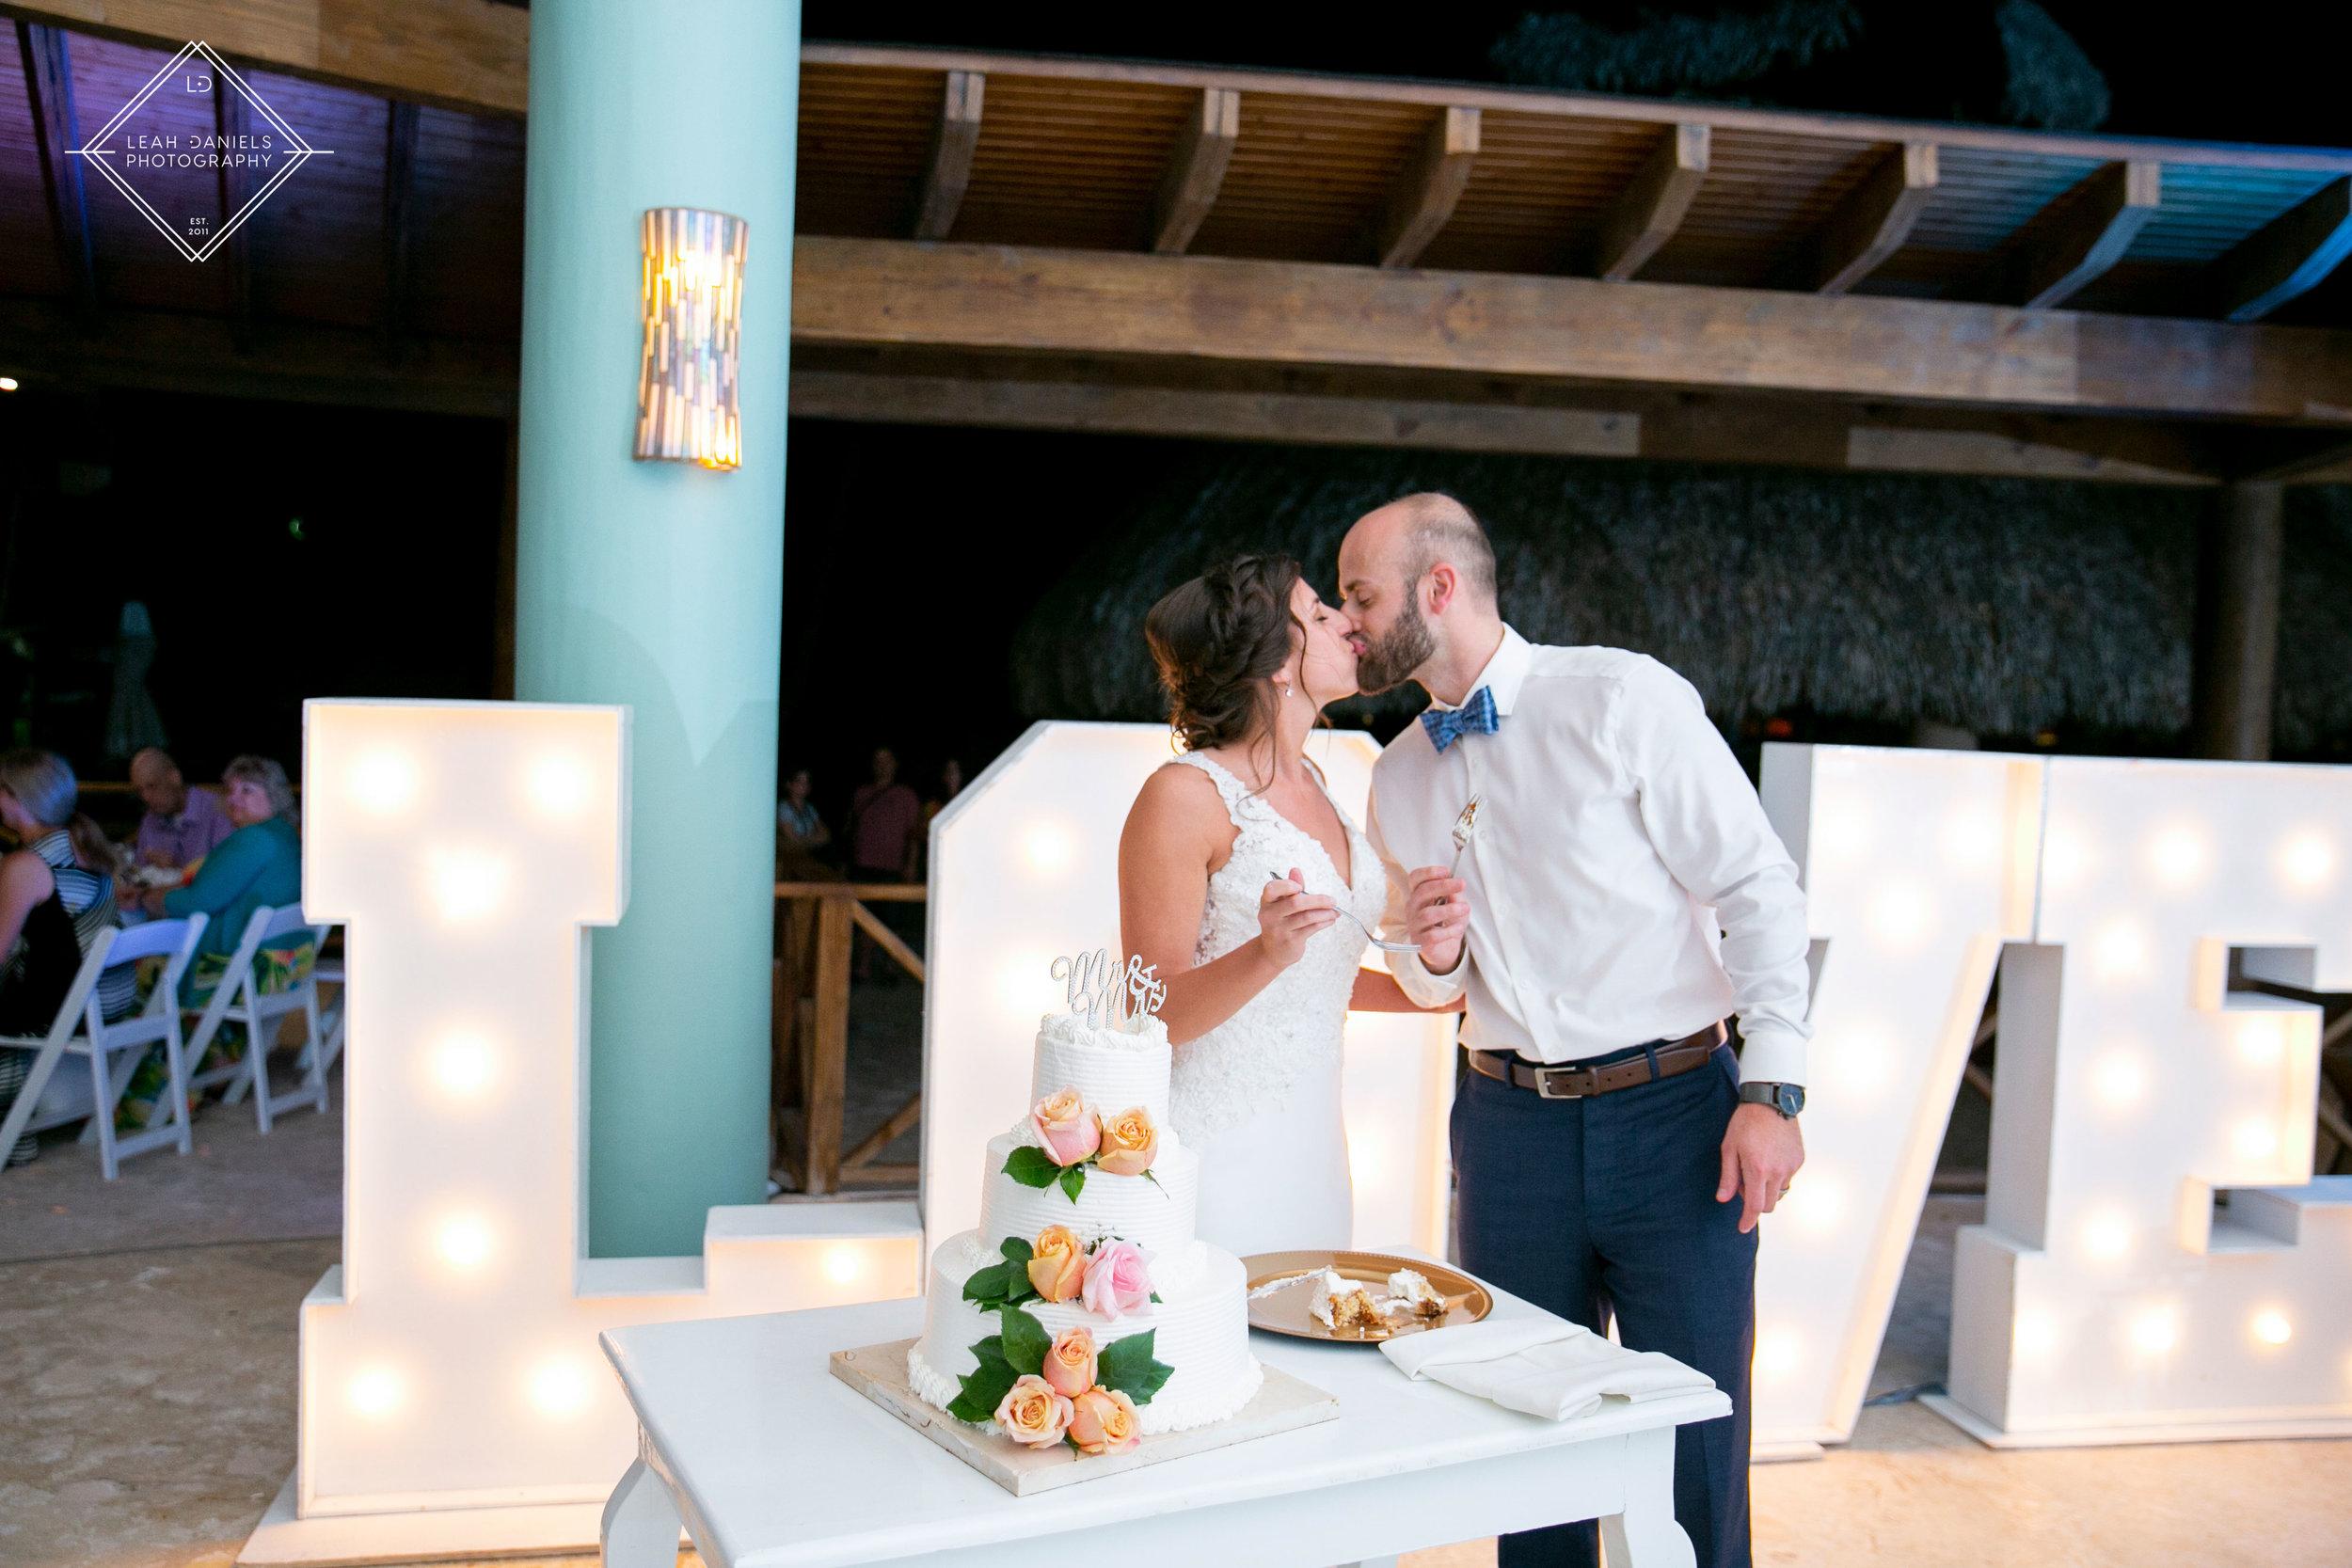 NOW Larimar Destination Wedding; The Cake Cutting